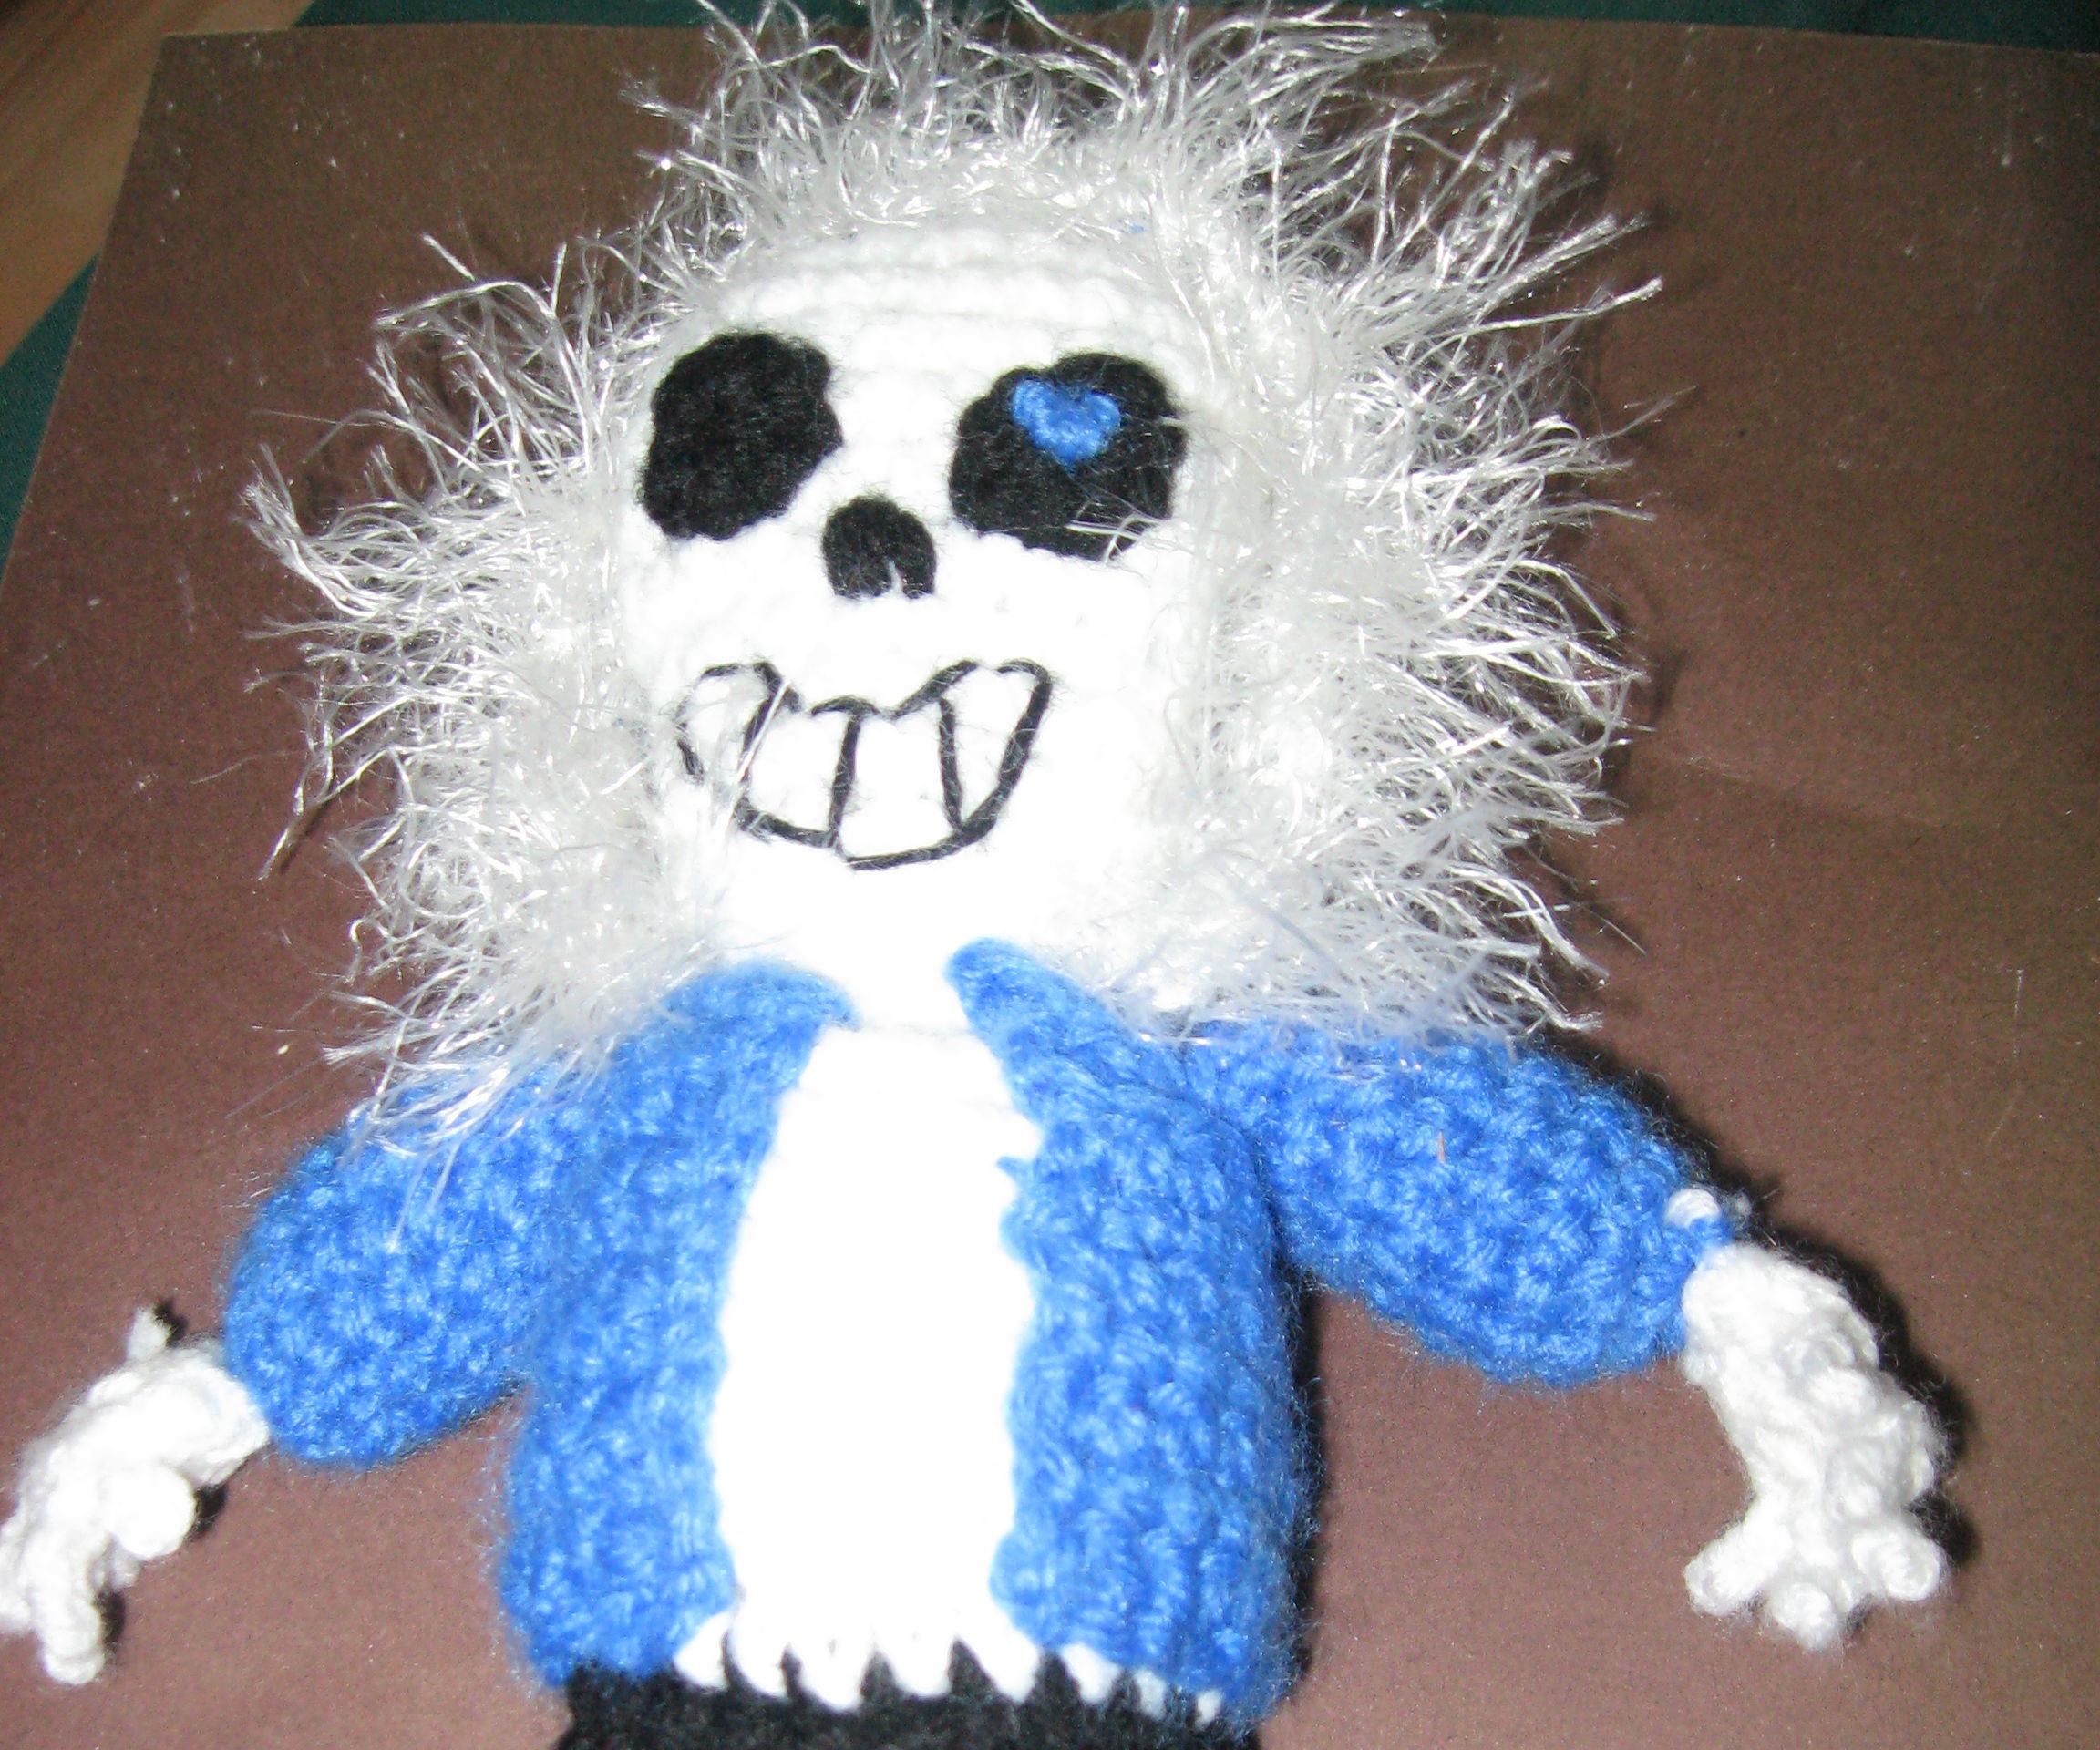 Crochet Sans (Undertale)